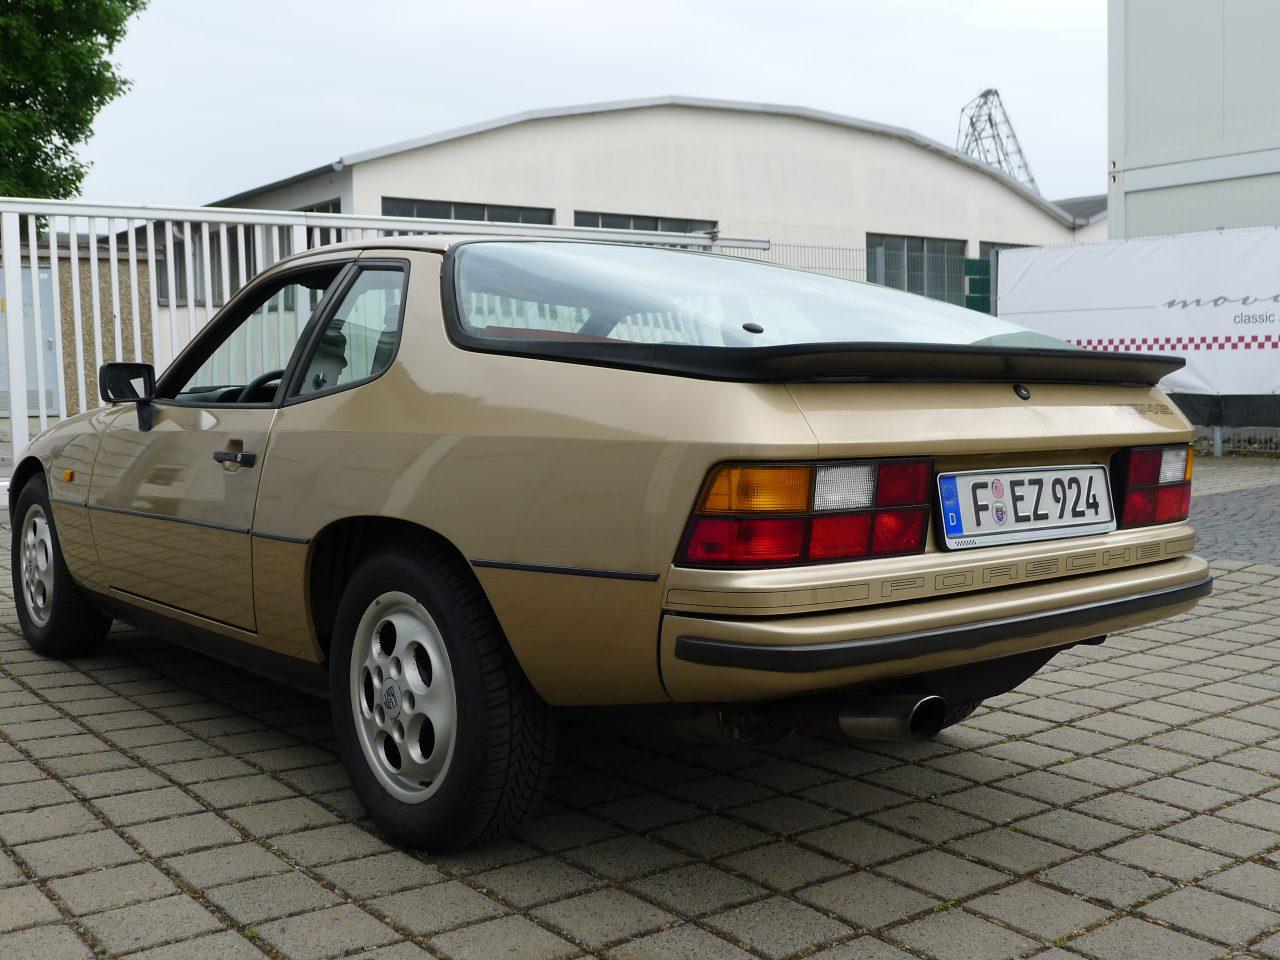 Porsche 924 S Automatik 171 Movisti Classic Automobiles